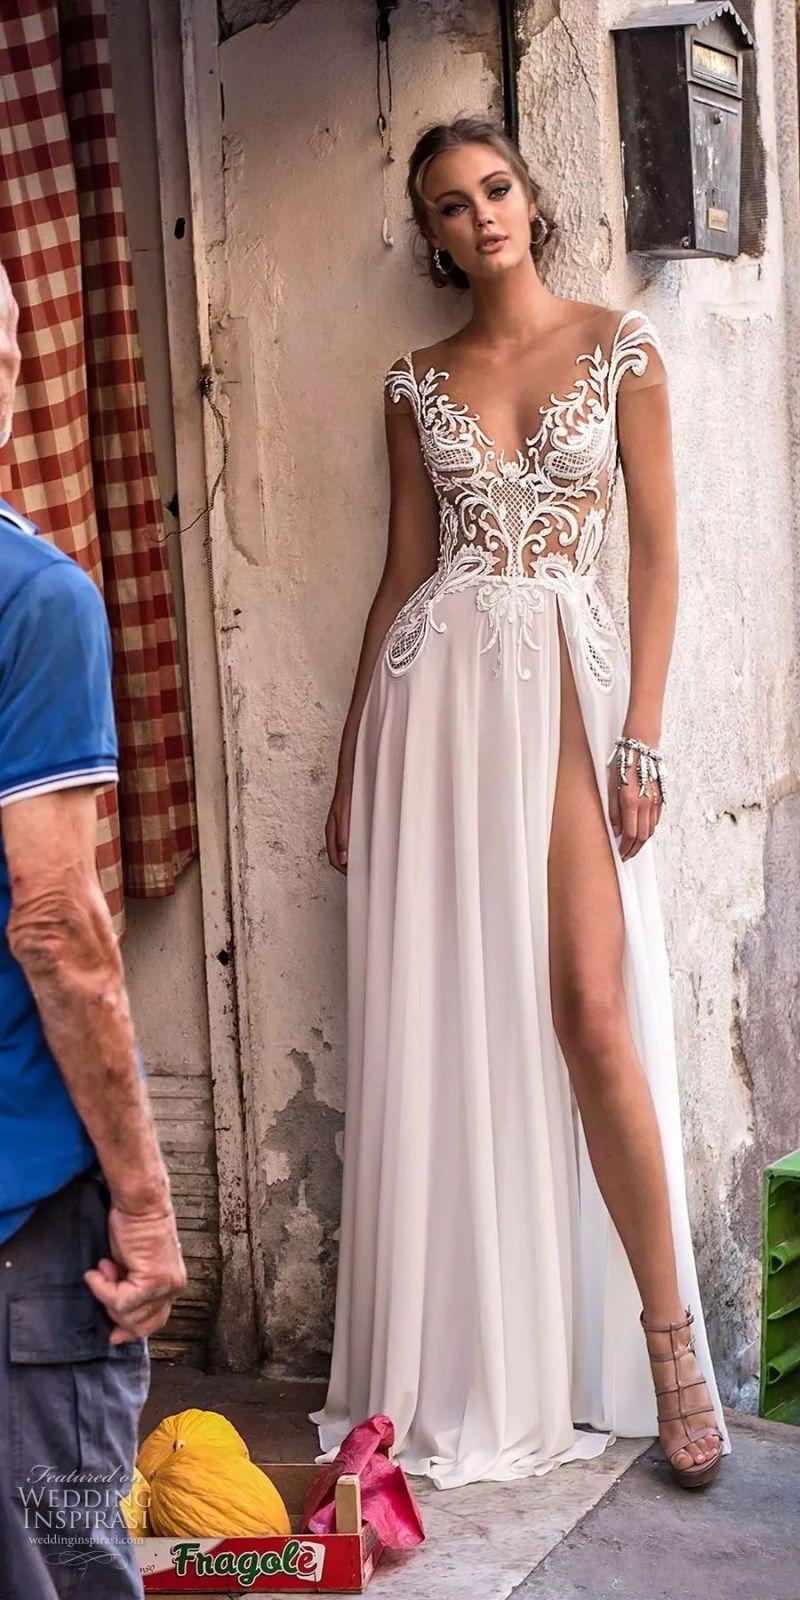 Berta 2018 Summer Beach Chiffon Wedding Dresses See Through Sexy Backless Cap Sleeves Split High Boho Bridal Gowns with Appliques